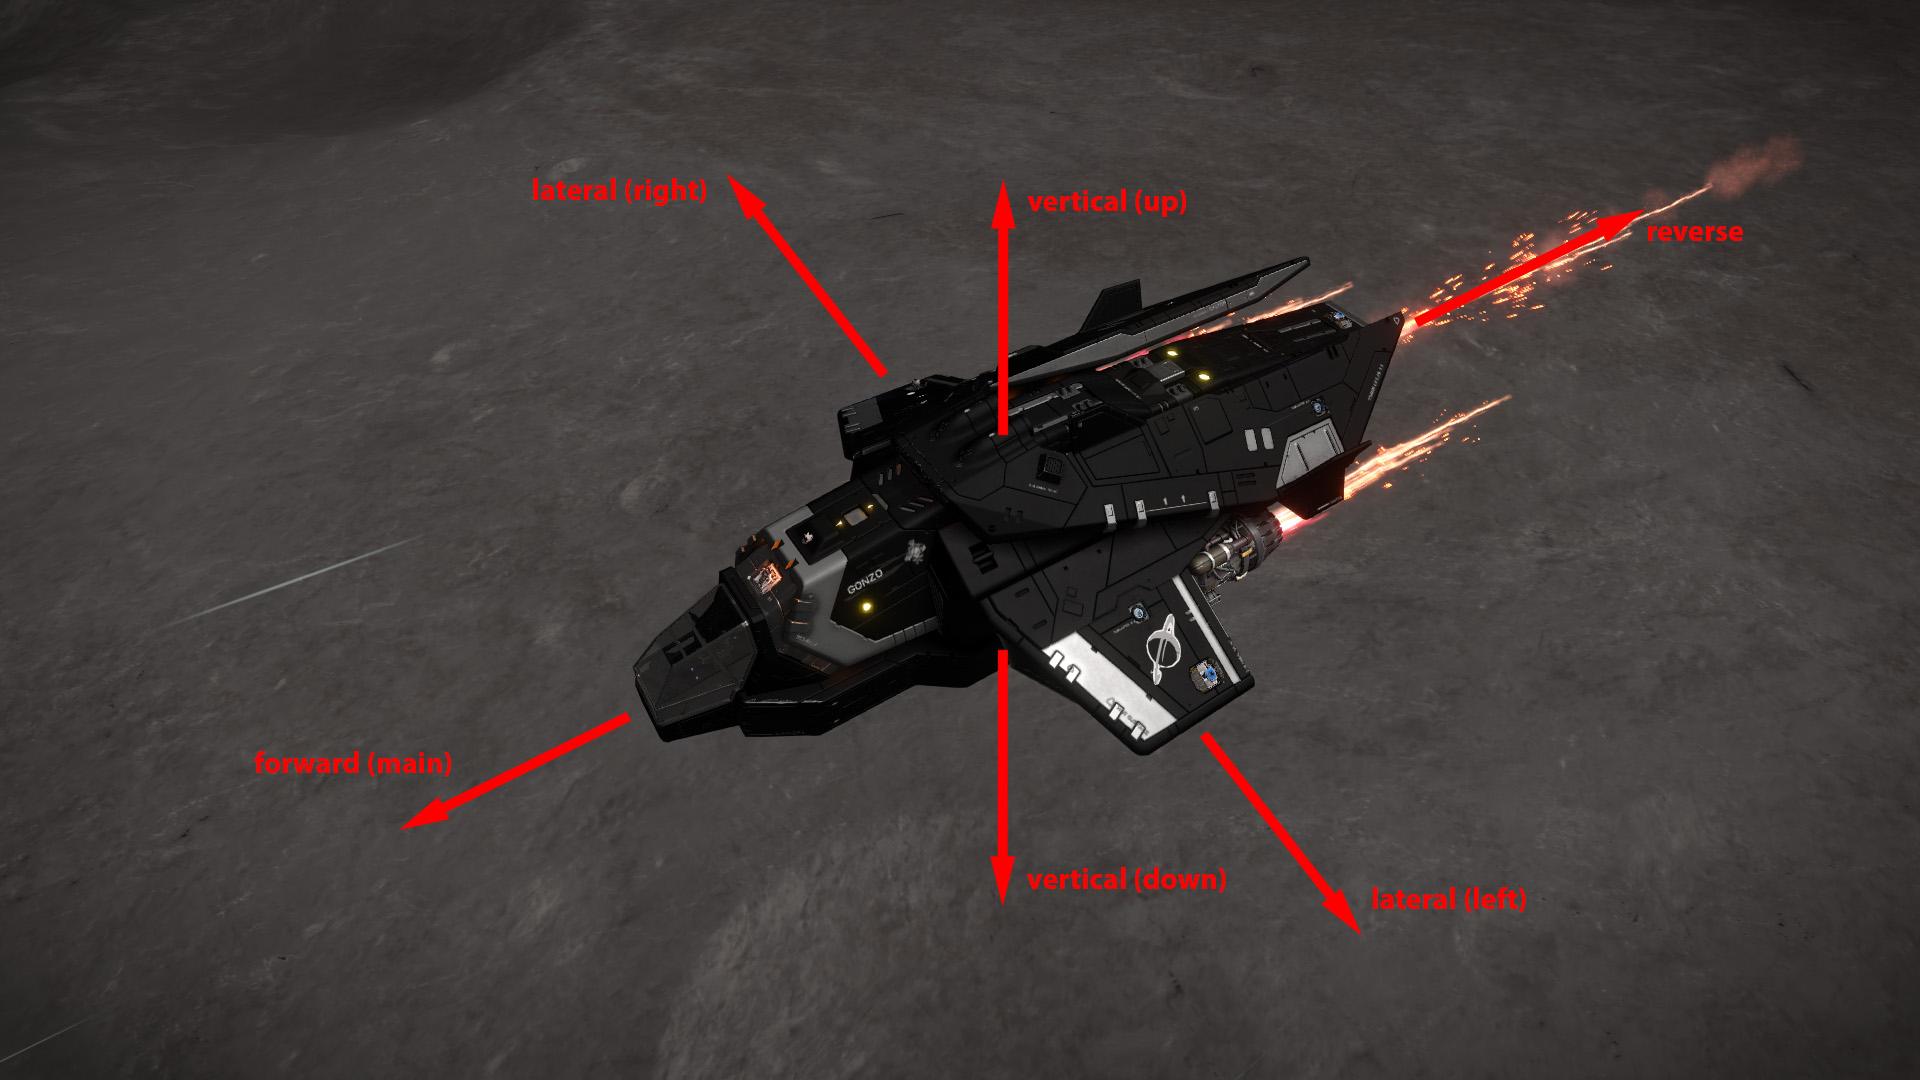 Elite: Dangerous beginner's guide: An annotated screenshot showing ship thrust directions